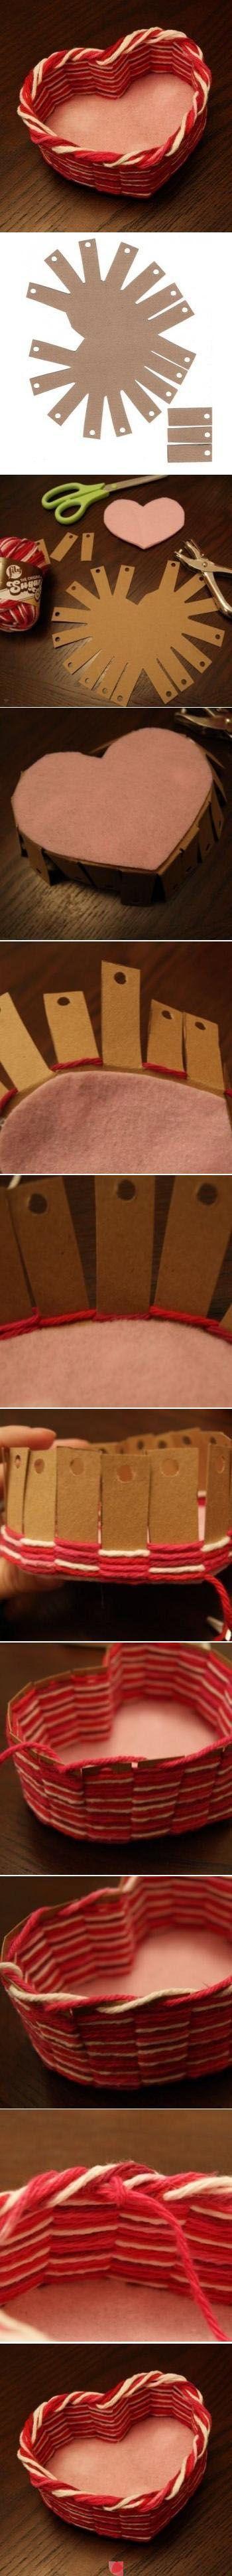 Fai da te Cuore Basket Immagini, Foto e immagini per Facebook, Tumblr, Pinterest, e Twitter